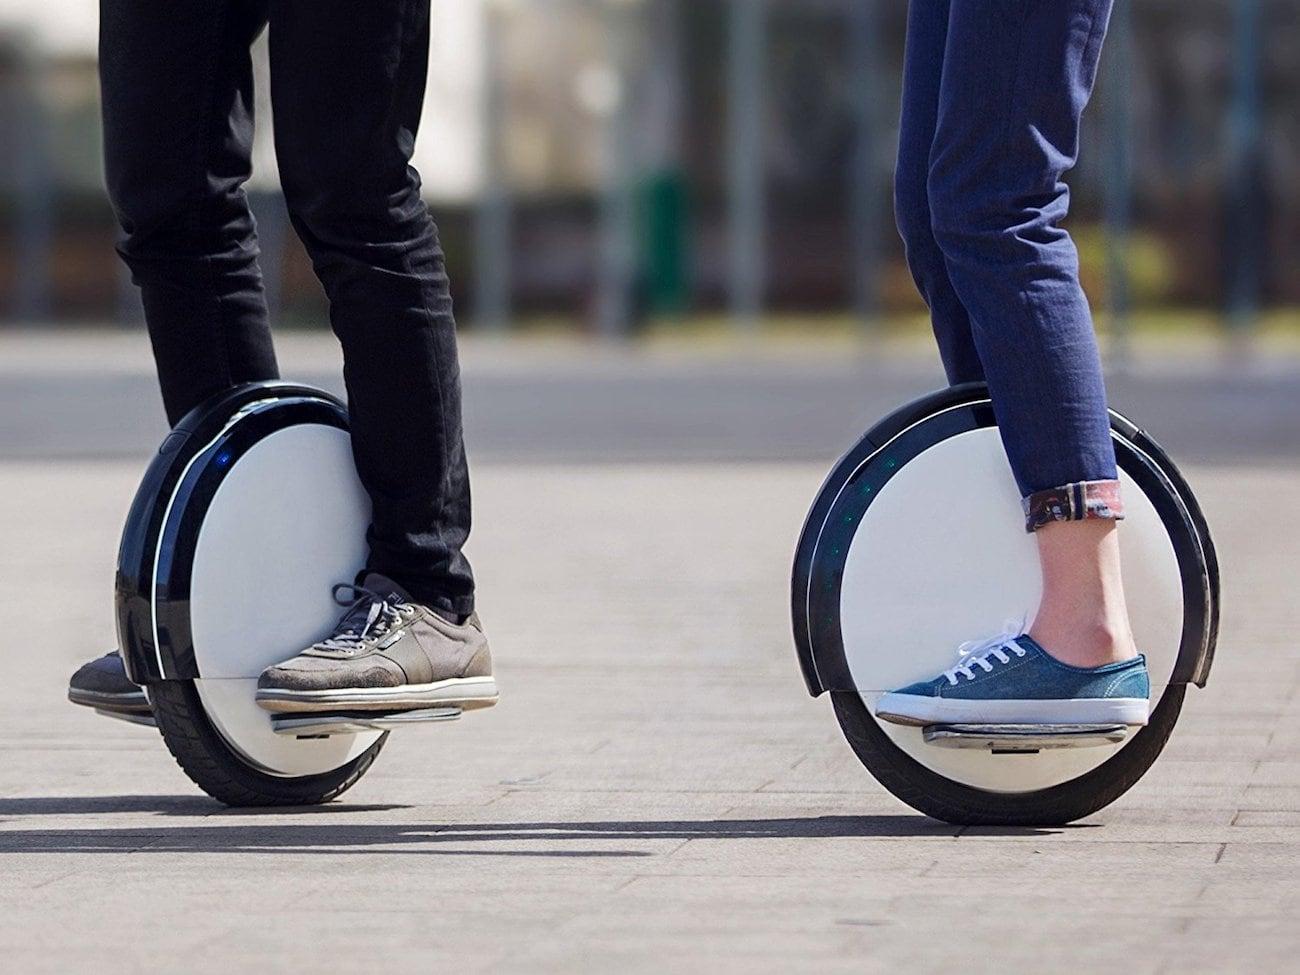 Segway One S1 Self-Balancing Monowheel